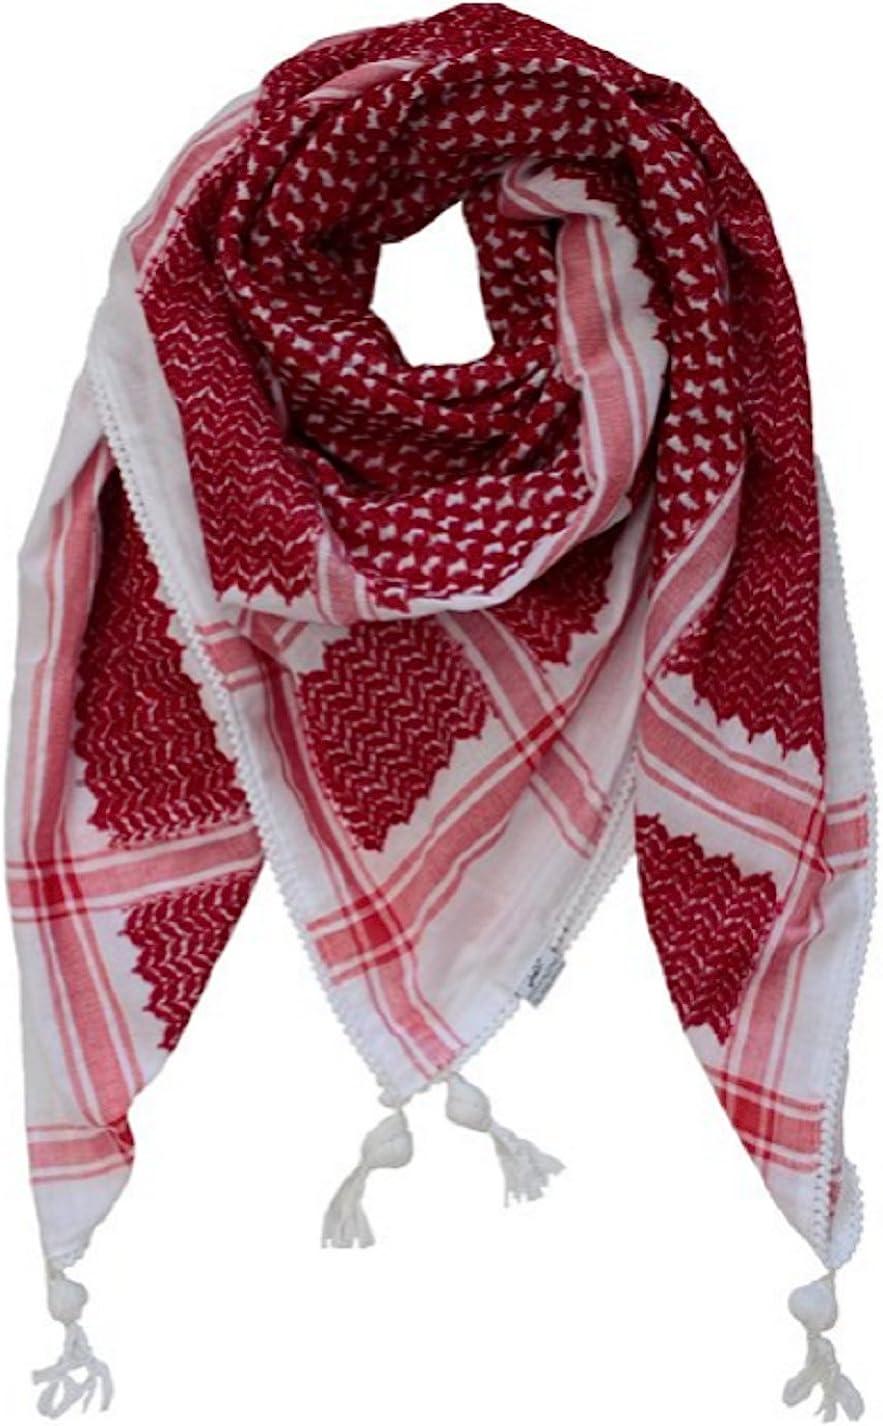 Amazon.com: Bethlehem Gifts TM Red White Arab Shemagh Head Scarf ...